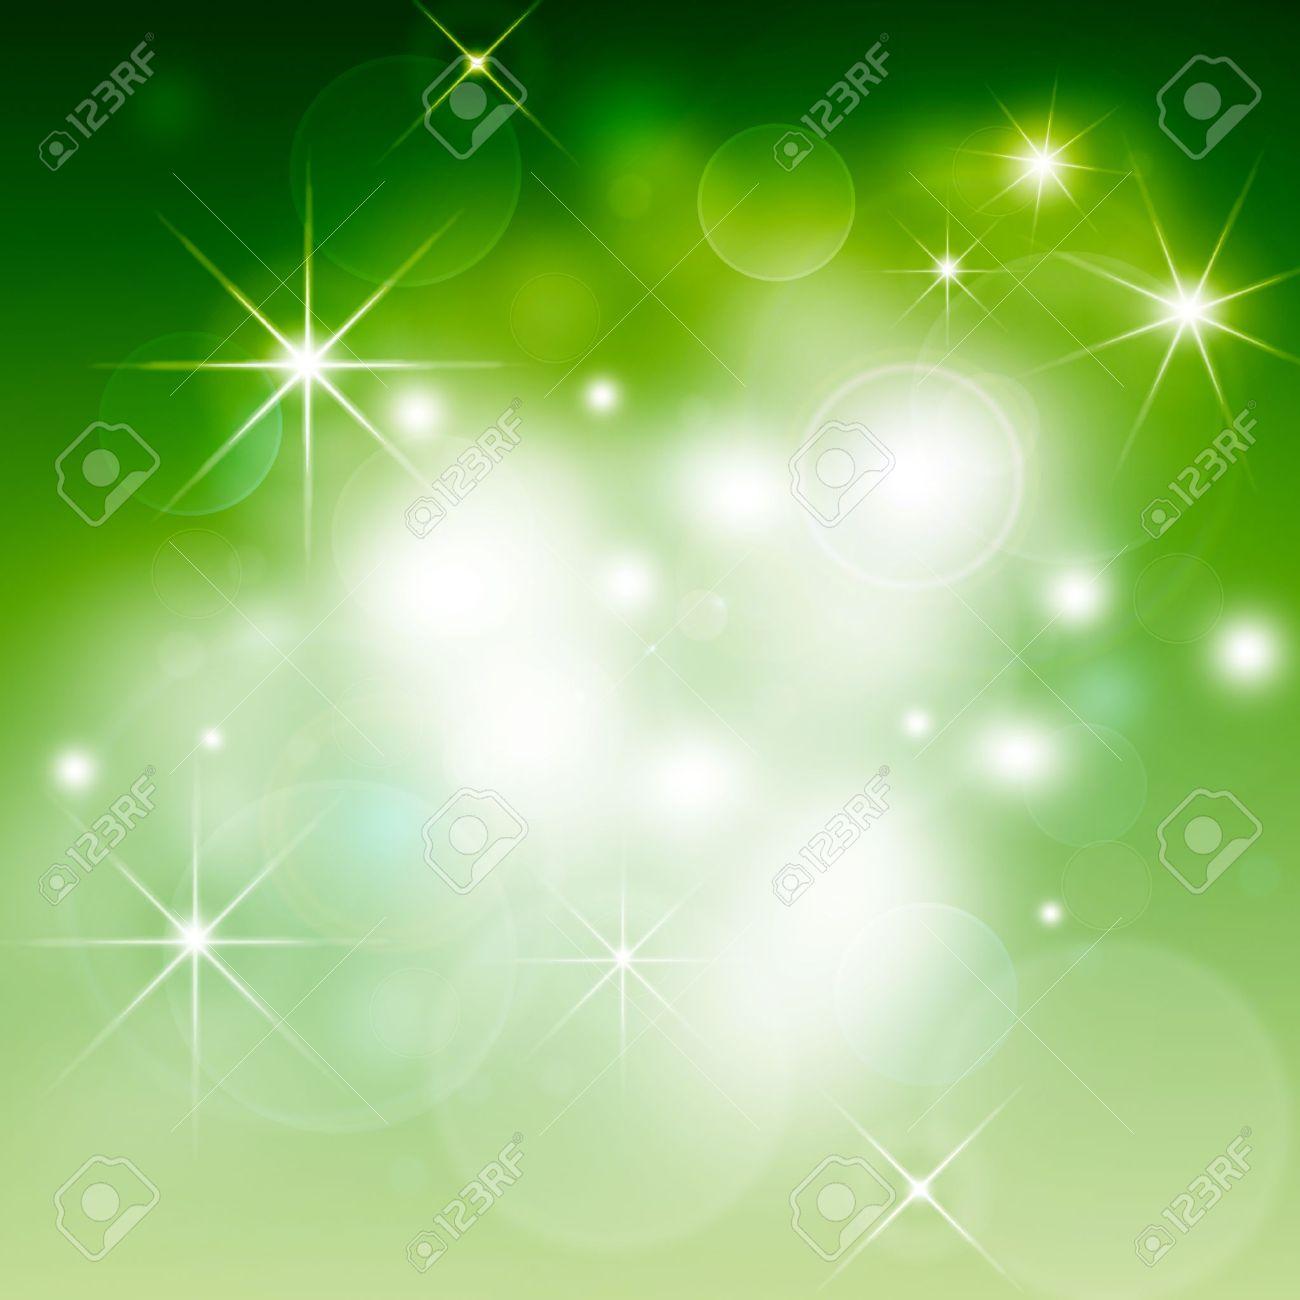 green Abstract illustration, Christmas background bokeh Stock Illustration - 16790386